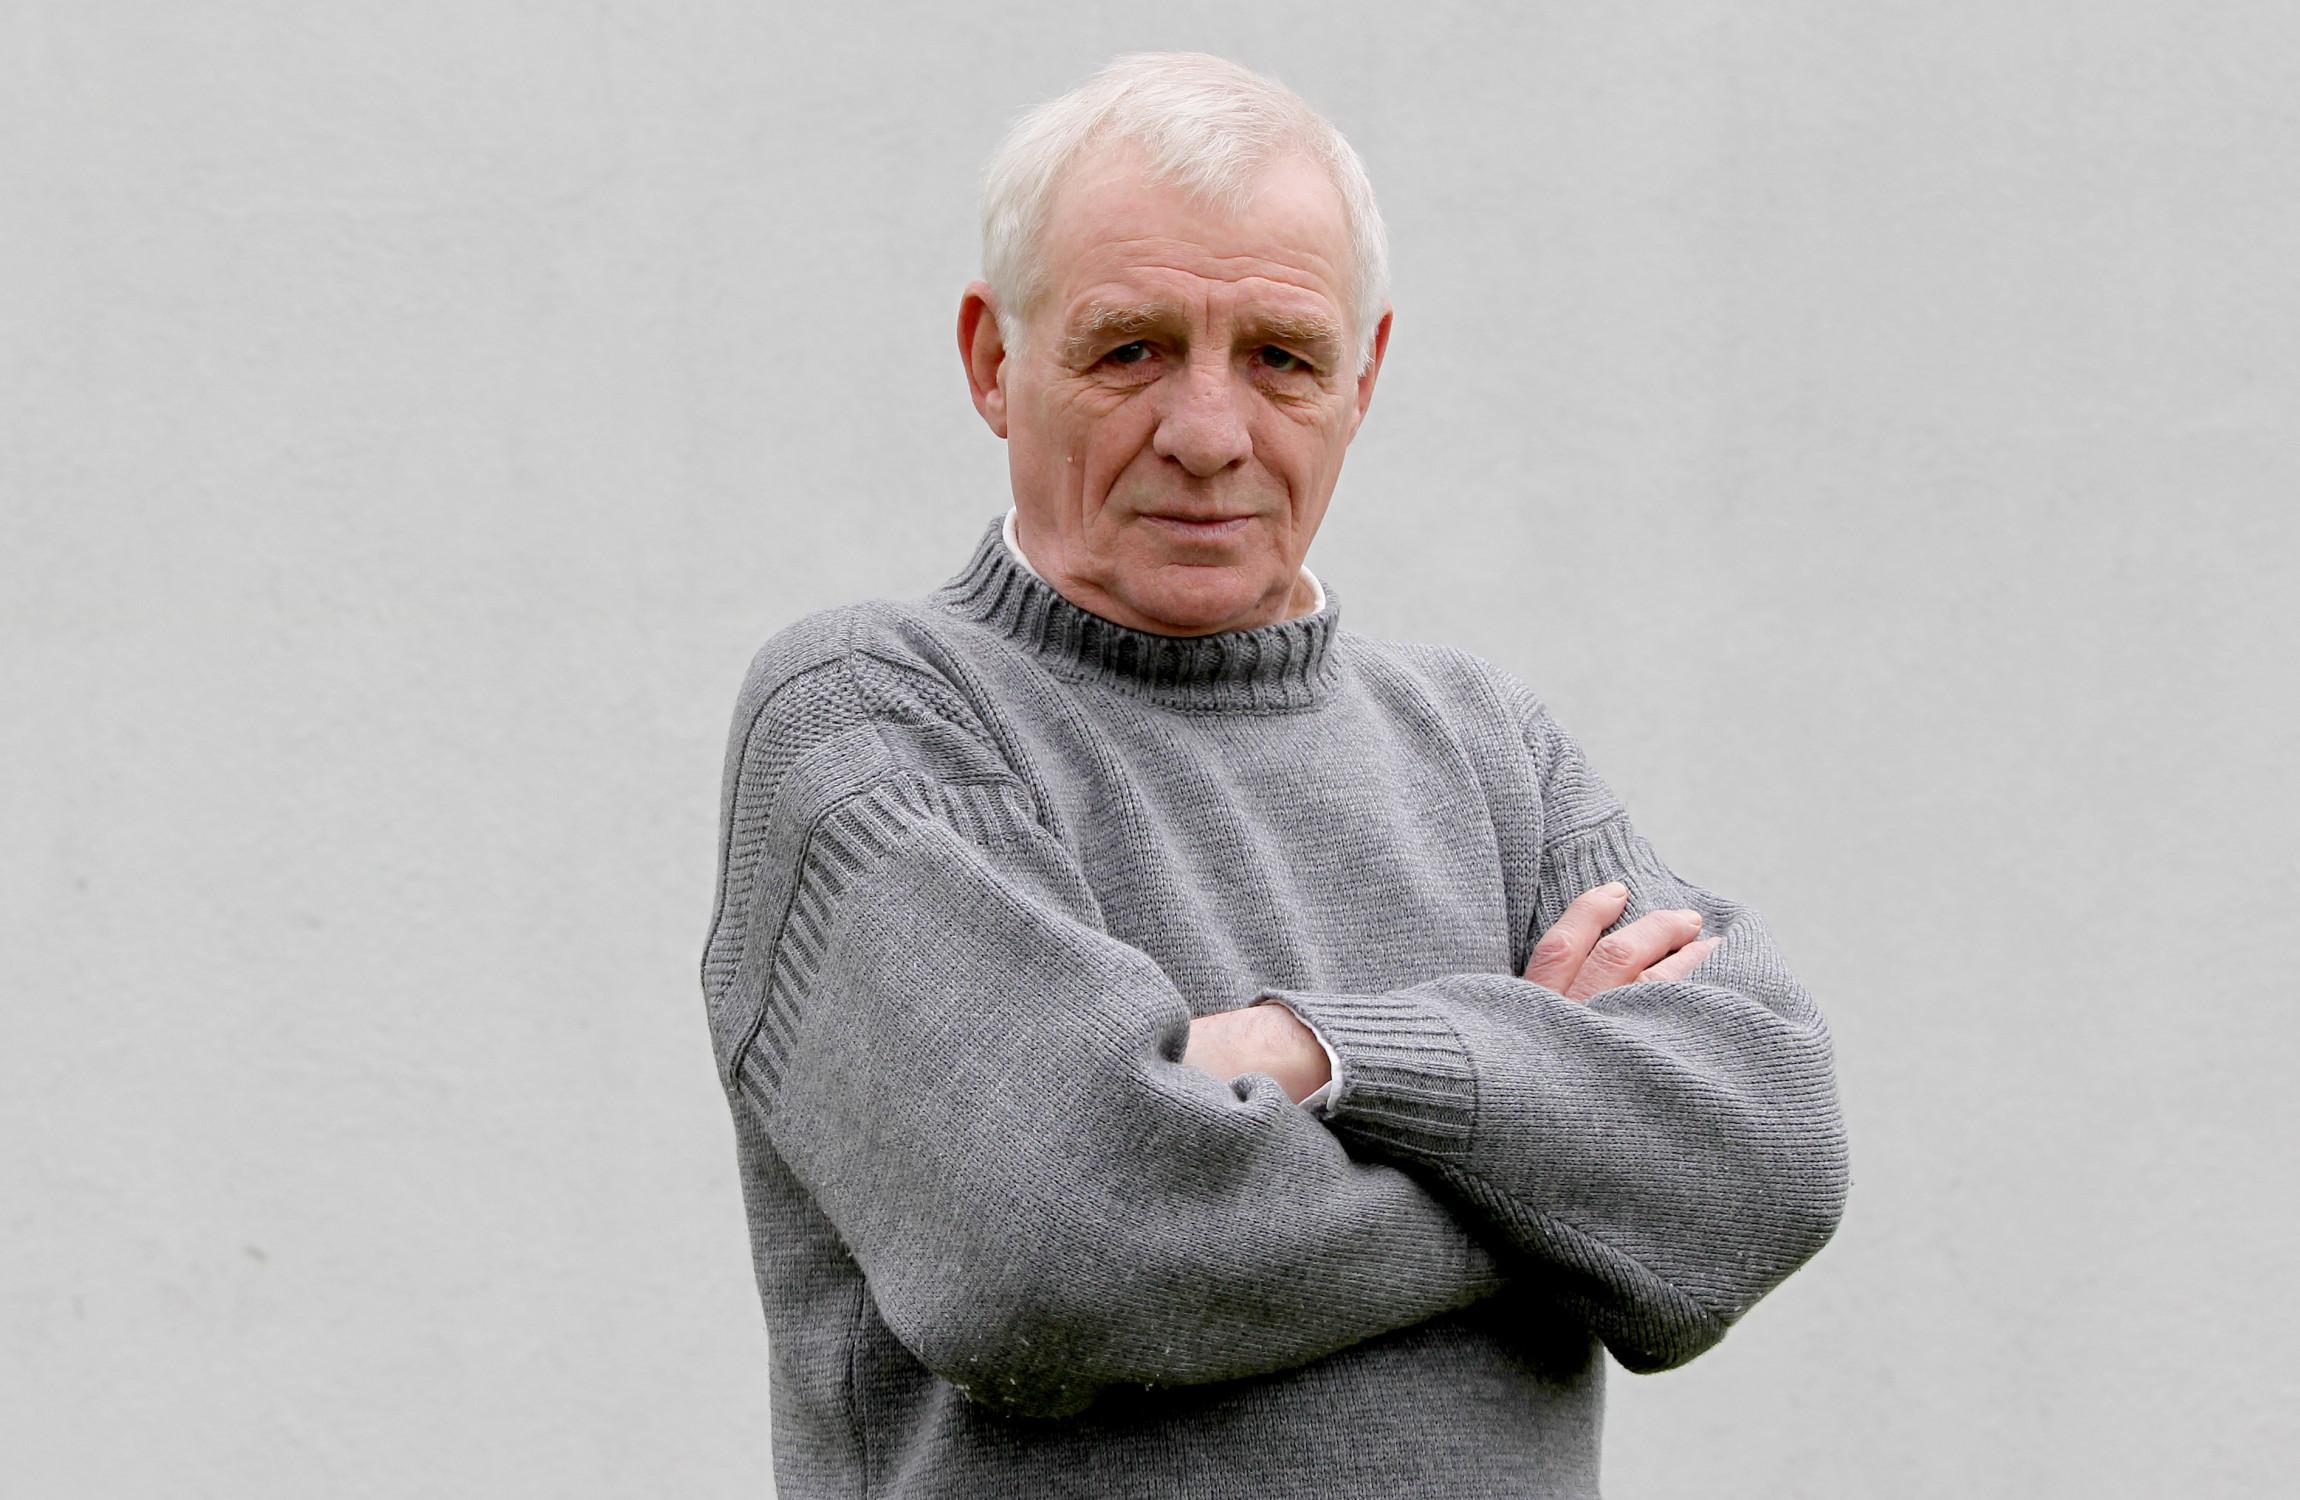 John Hartson thinks Chris Coleman will walk away from Wales job